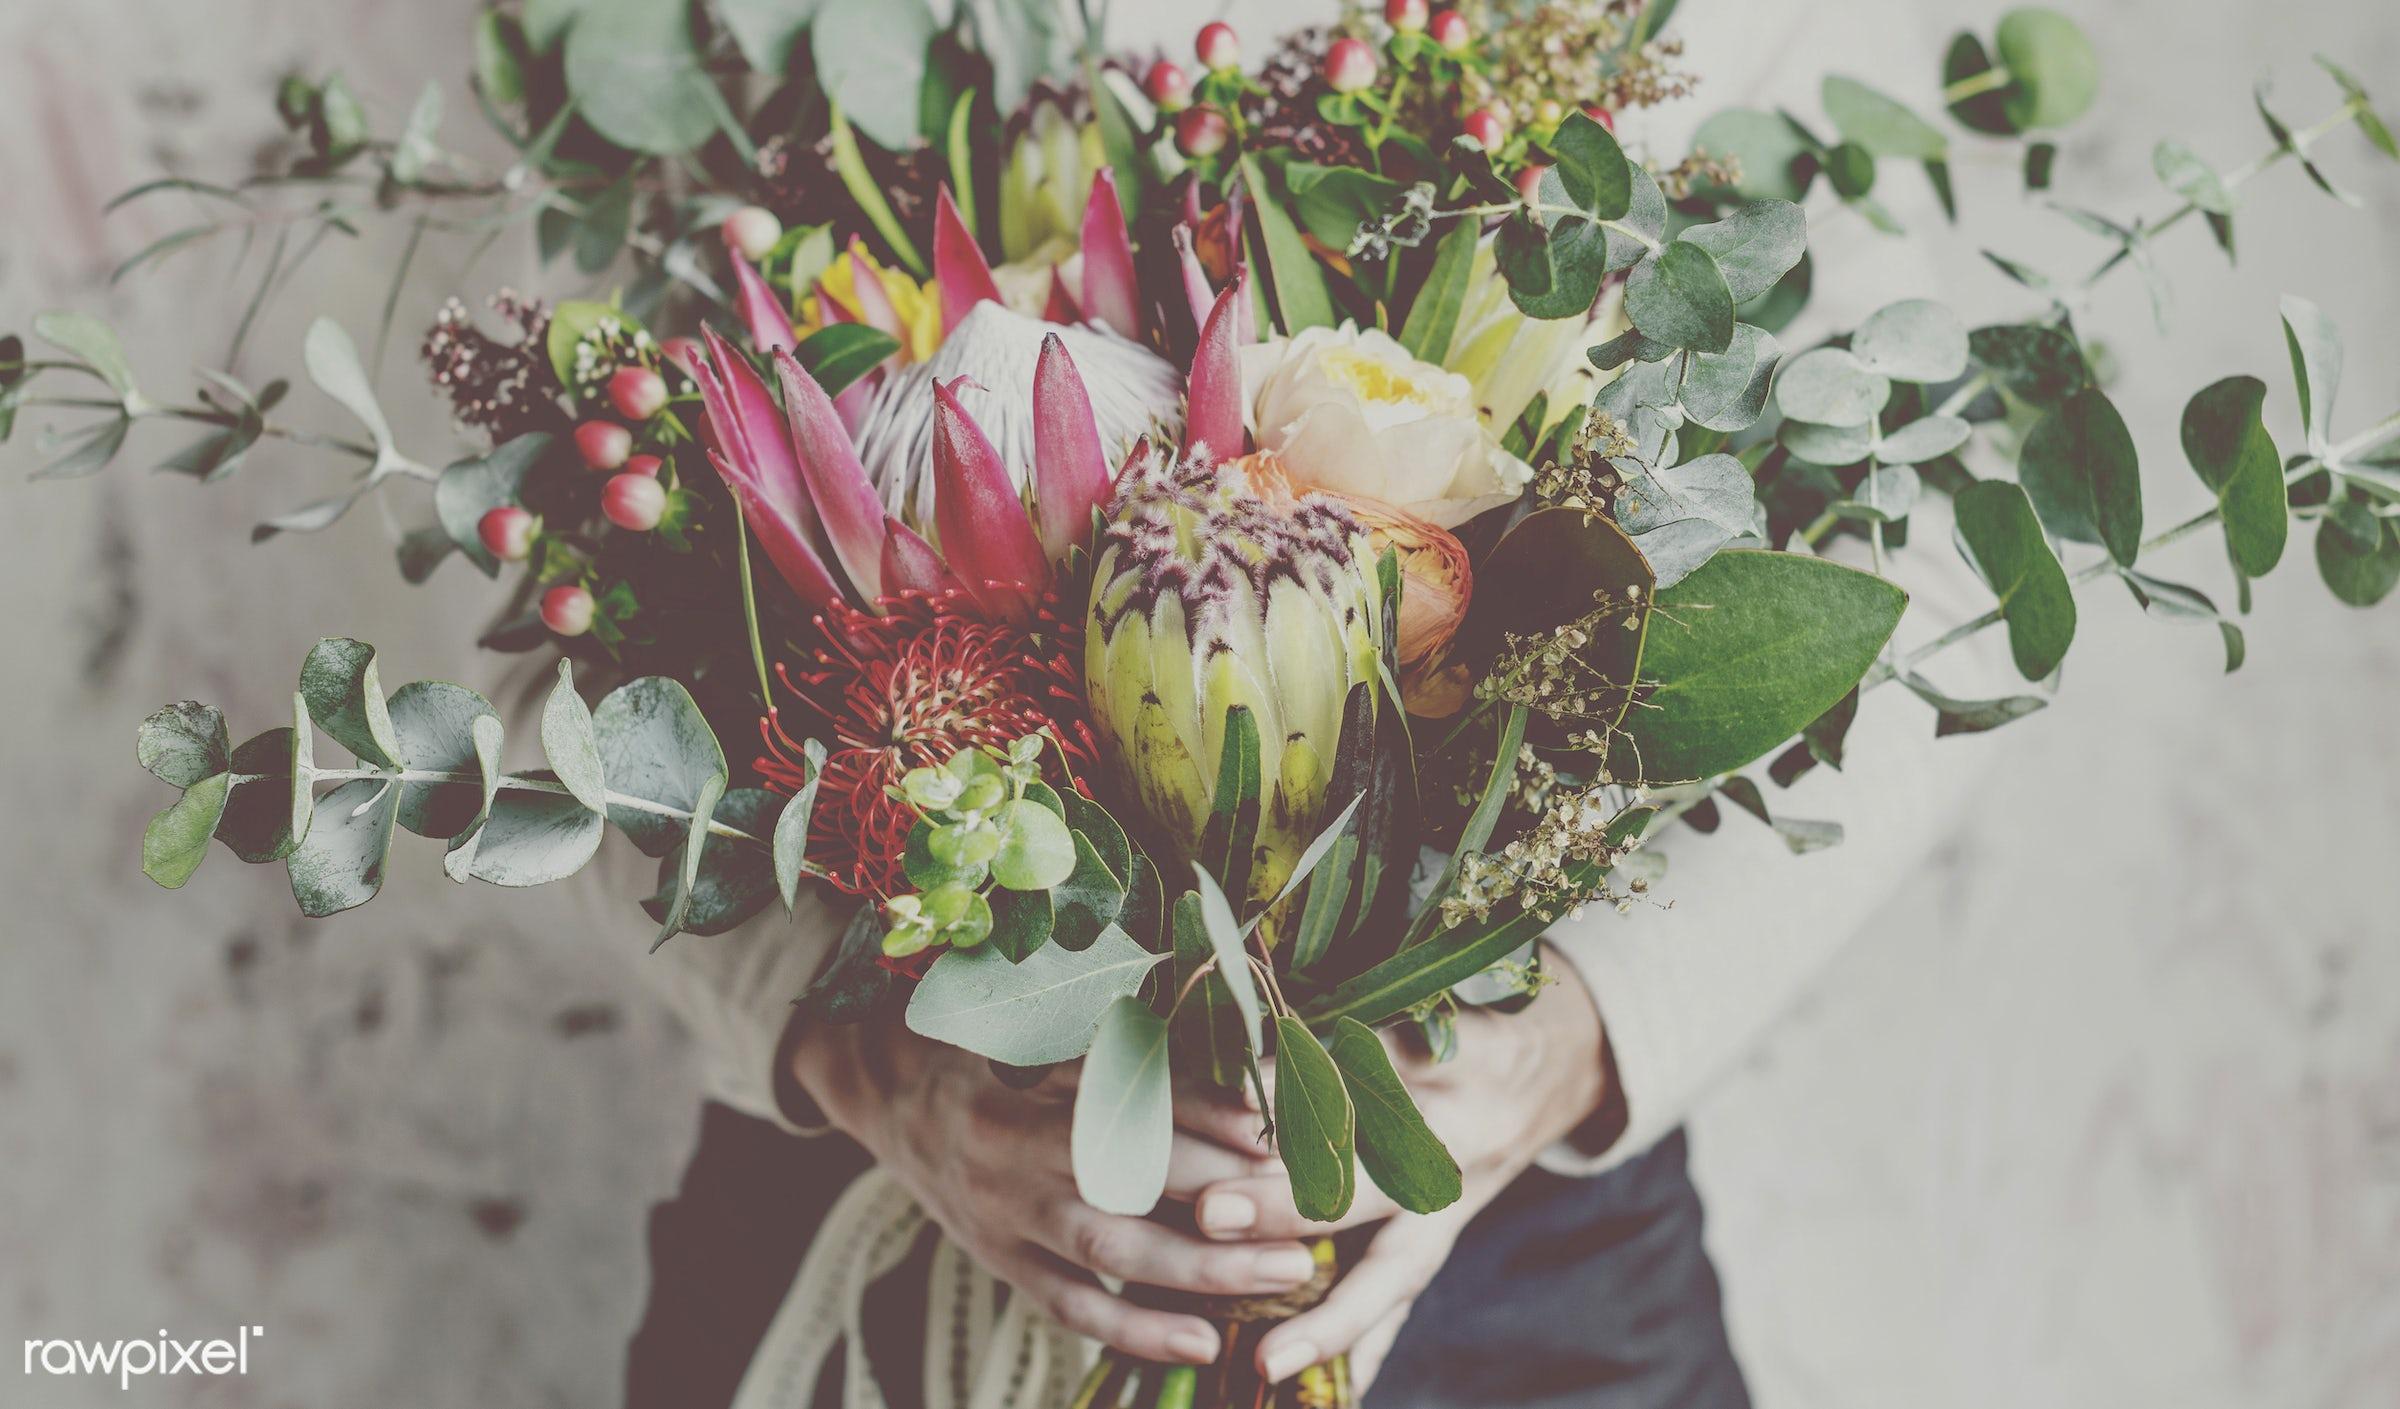 bouquet, detail, person, decorative, diverse, holding, colorful, plants, show, people, spring, blossom, love, decor, nature...